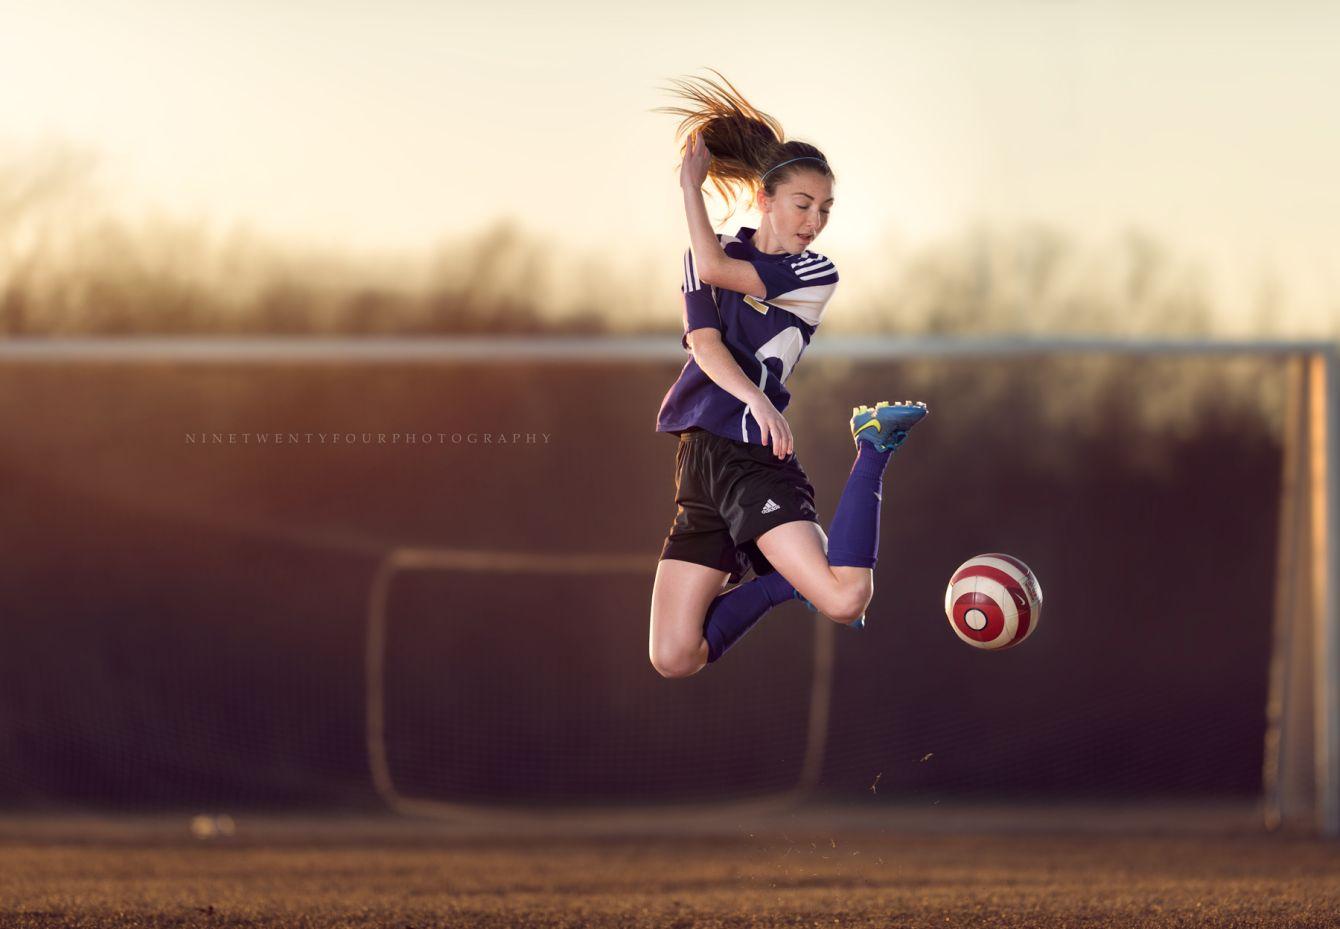 girls-playing-soccer-06